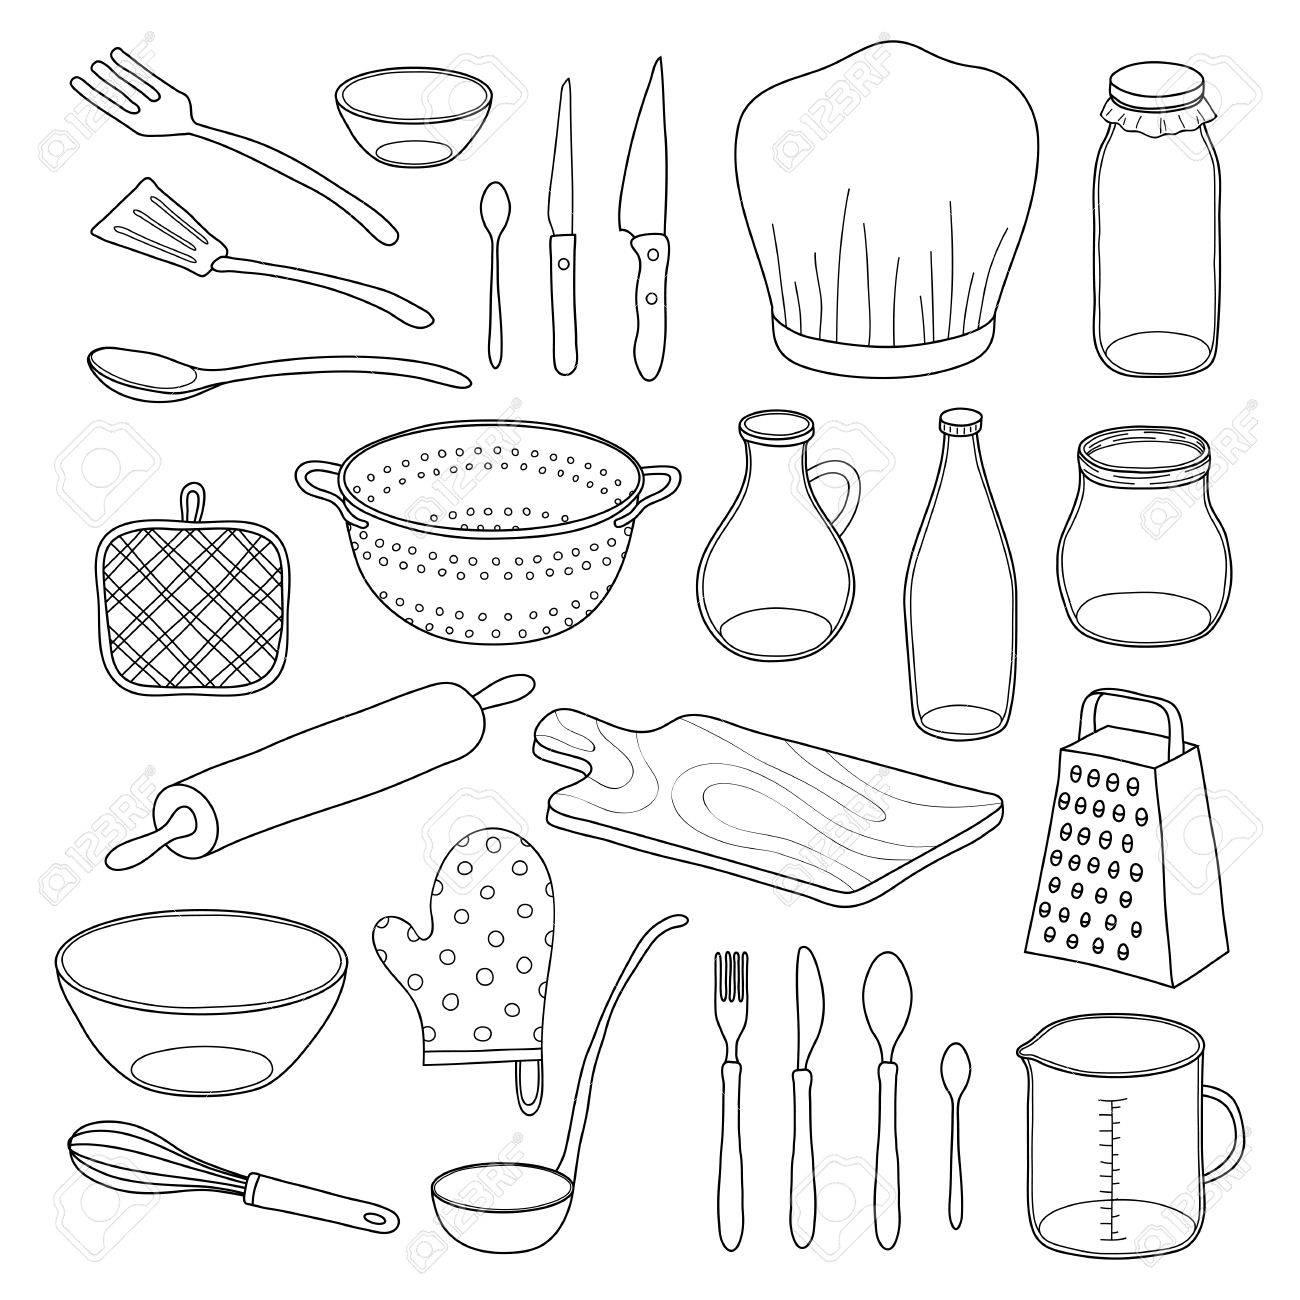 White Kitchen Utensils hand drawn outline kitchen utensils isolated on white background